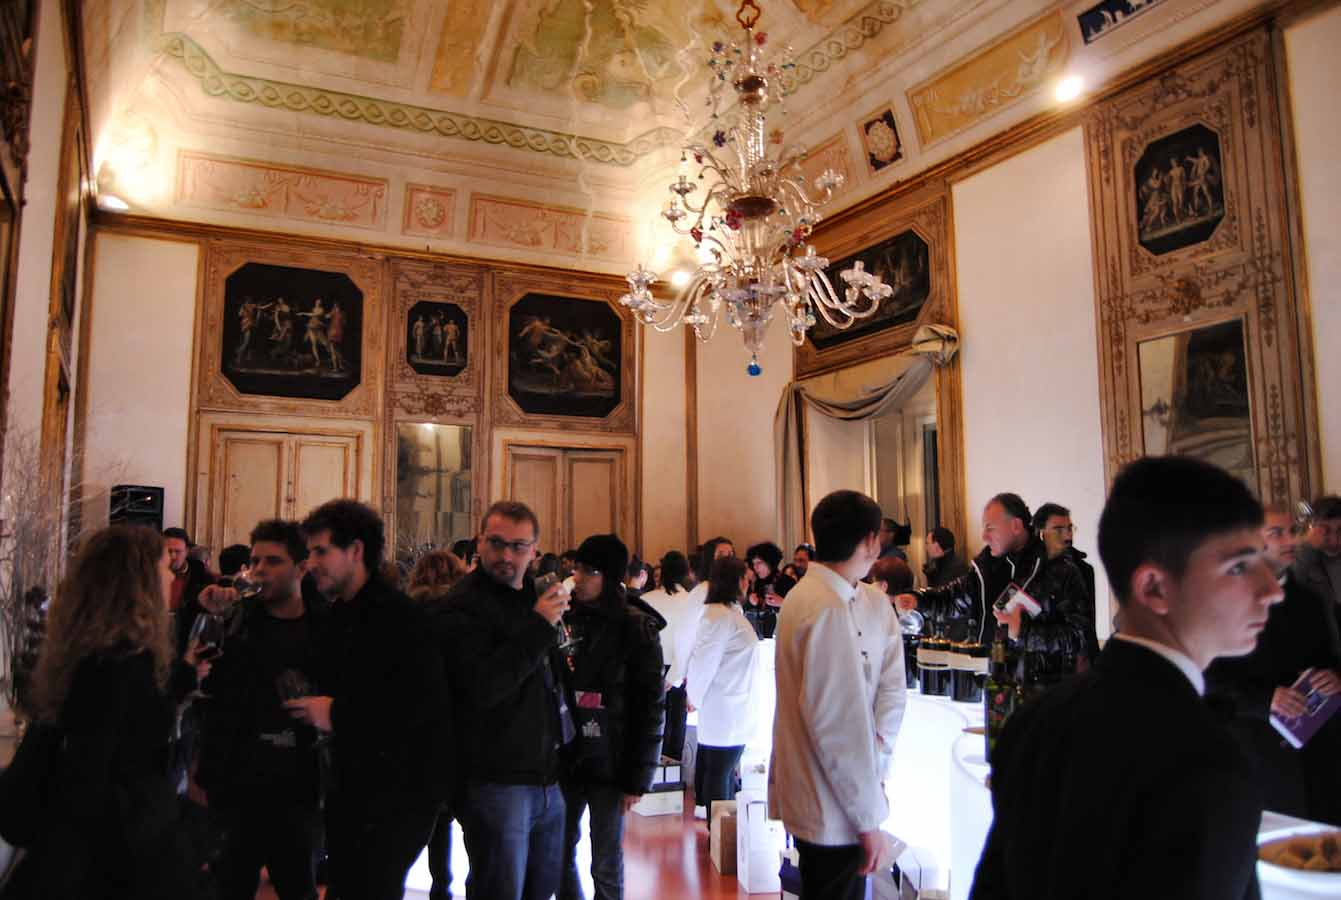 sud experience wedding and mice event puglia basilicata matera altamura bari